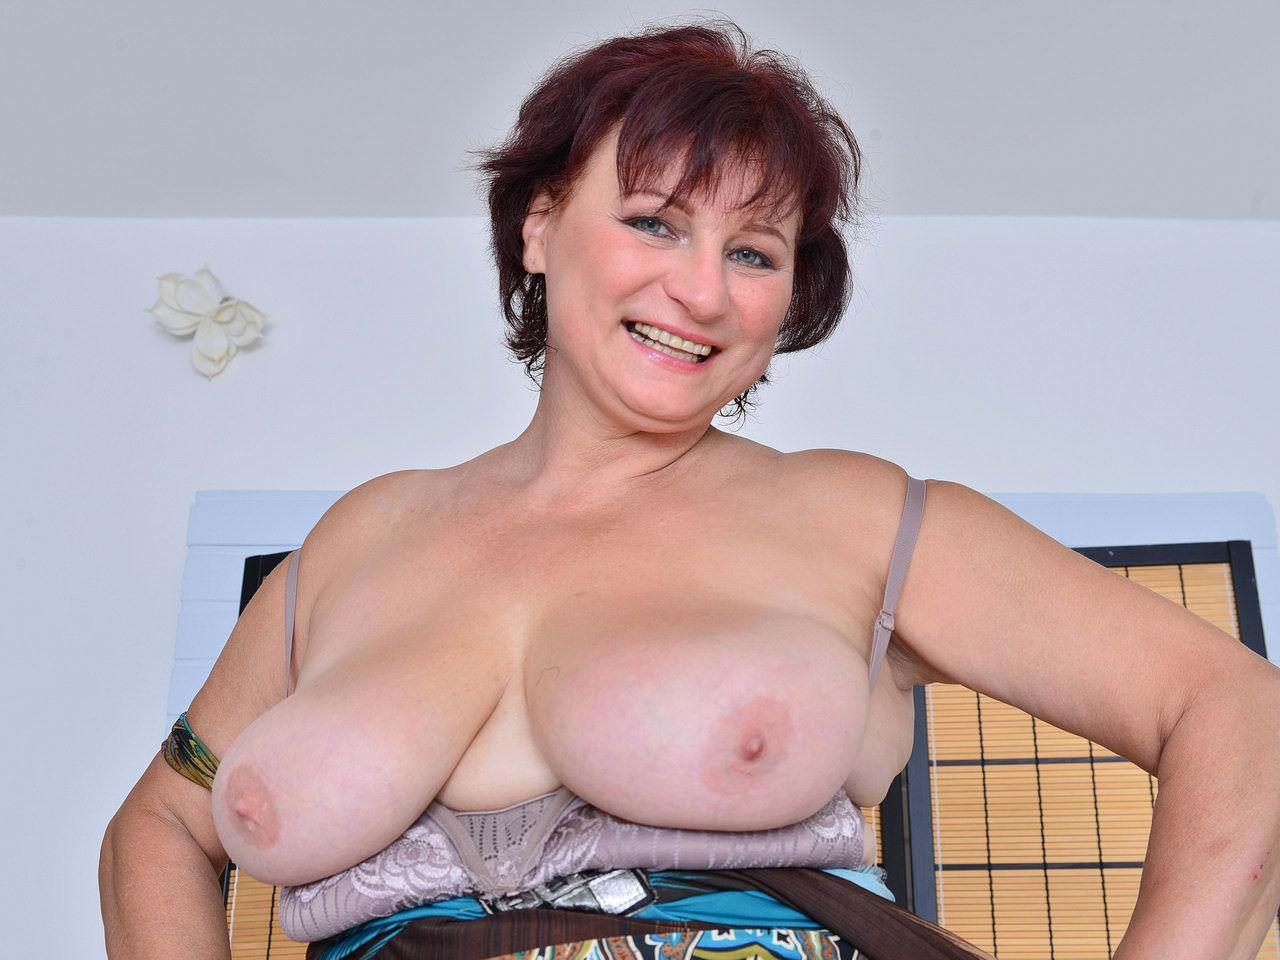 Bacie Porno euro gilf danja doesn't wear panties today